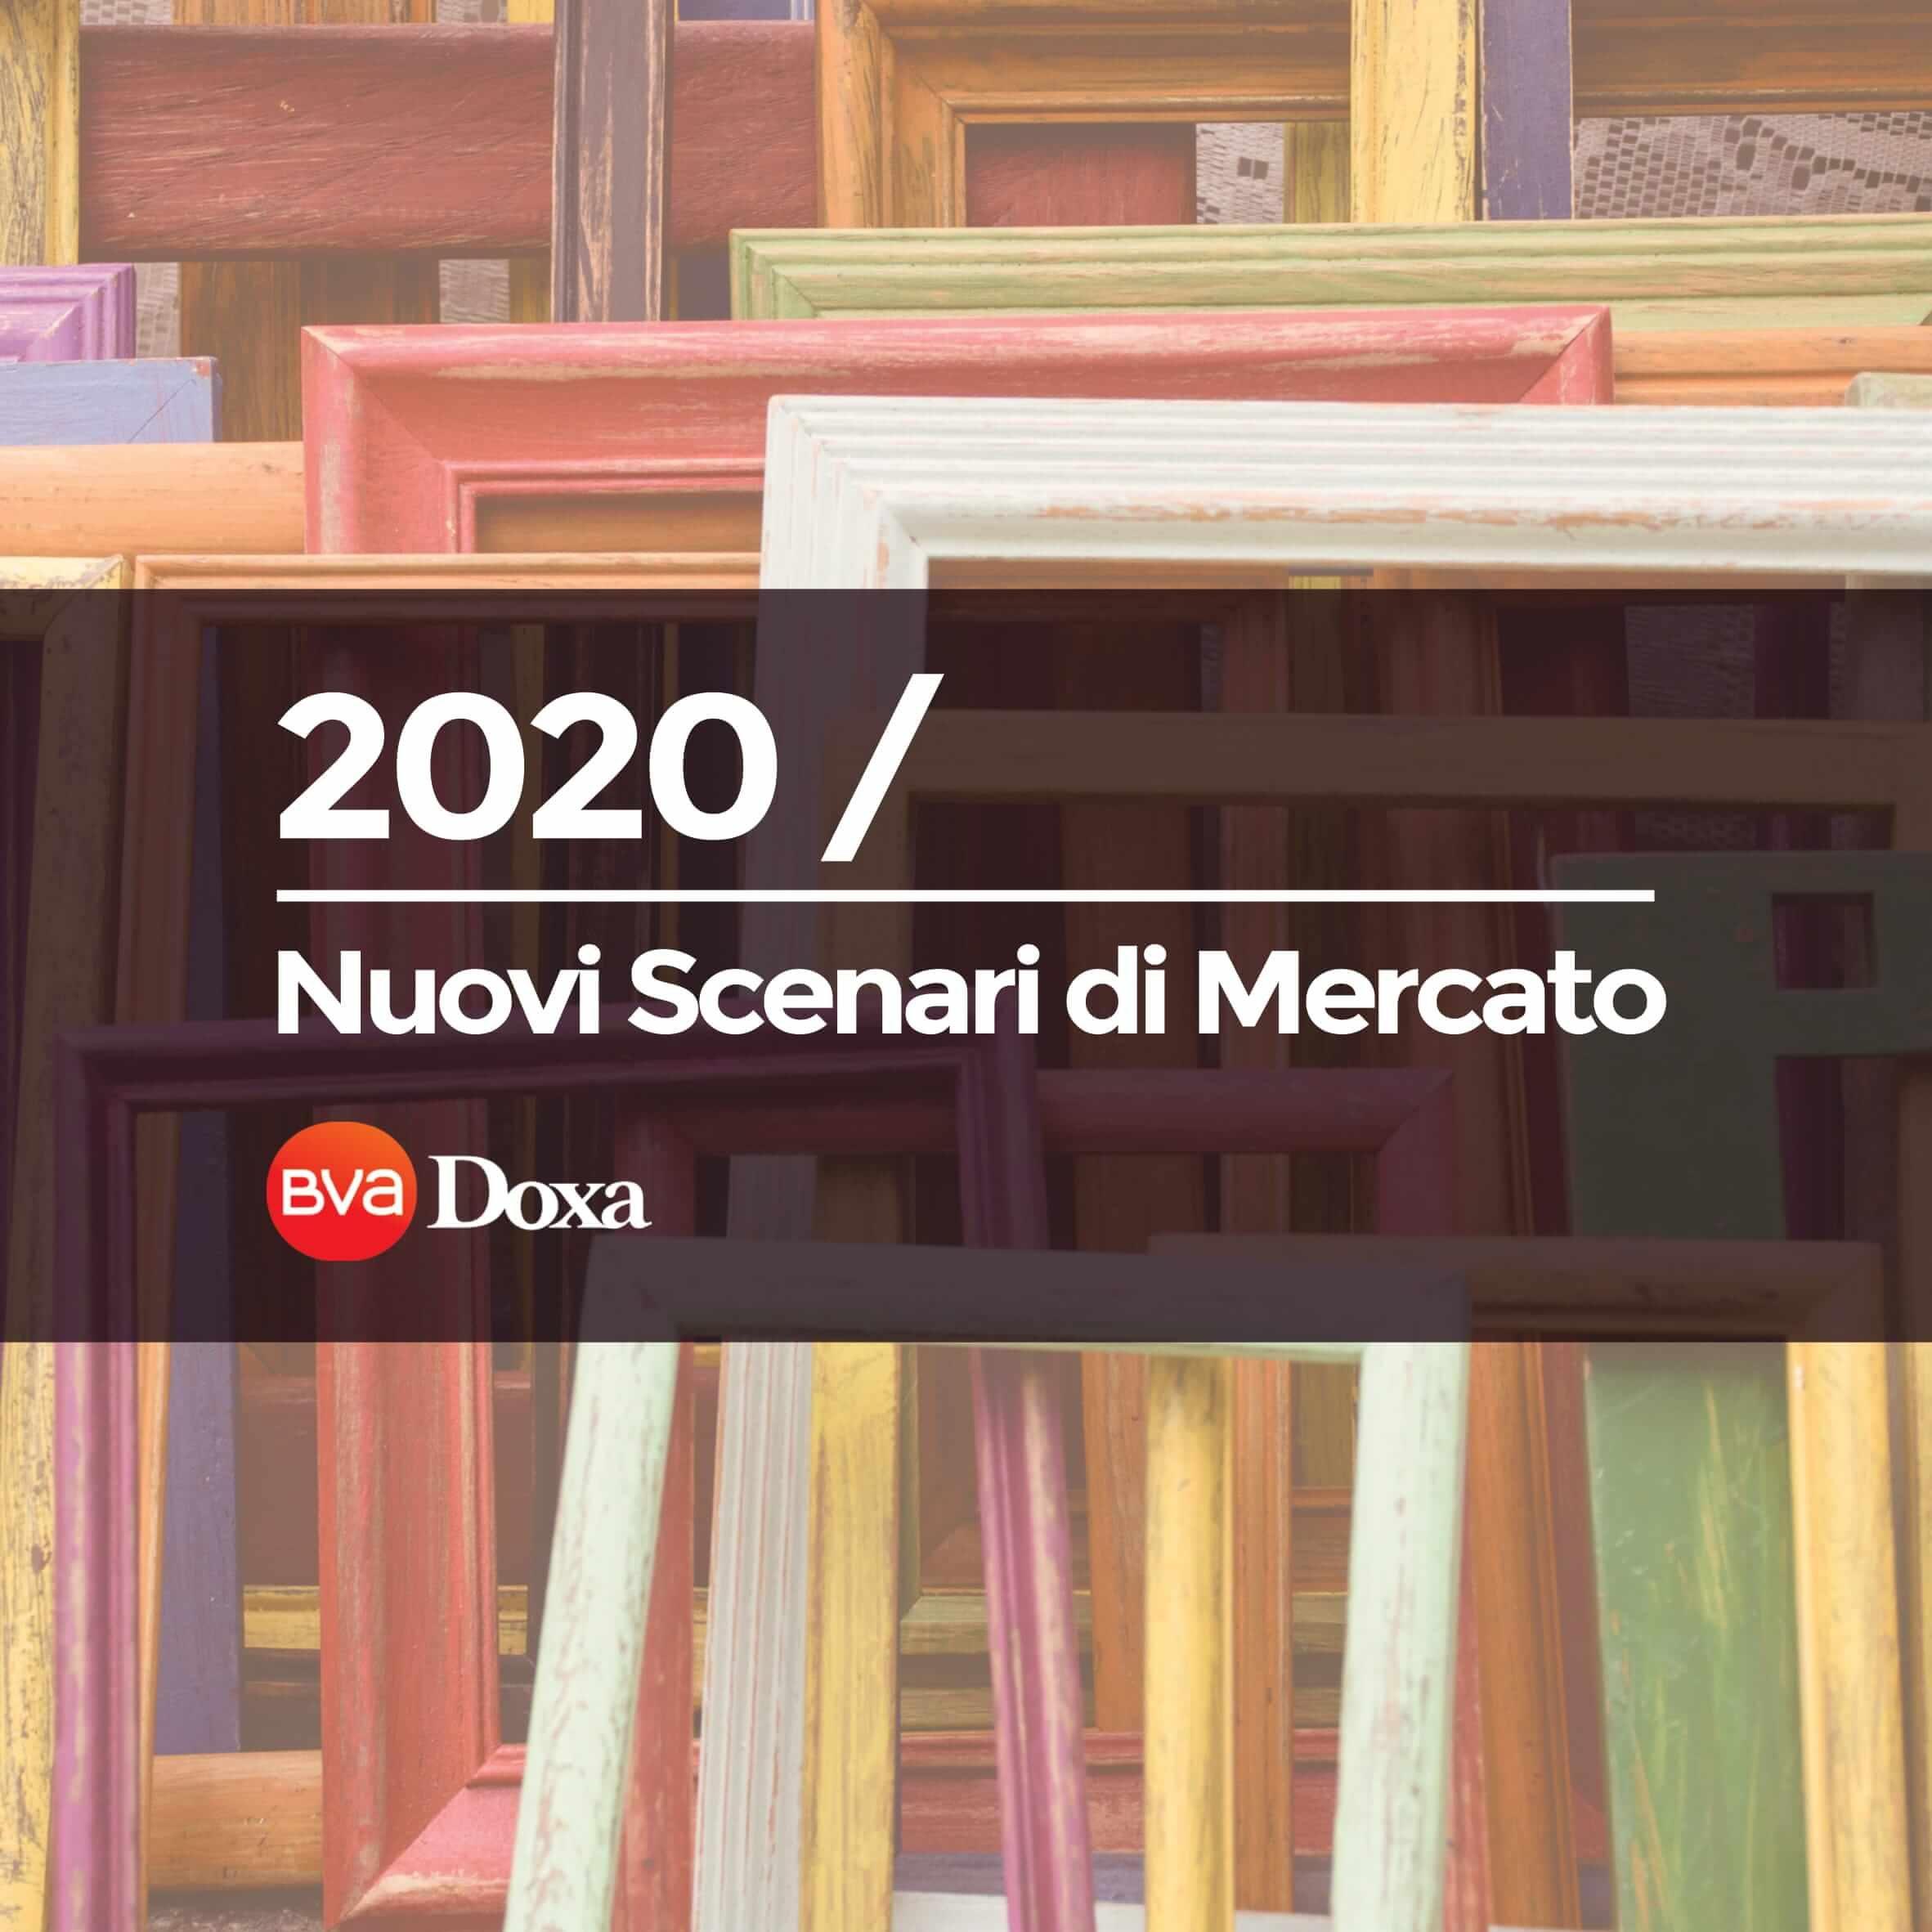 Bva Doxa Nuovi Scenari 2020 Short 01